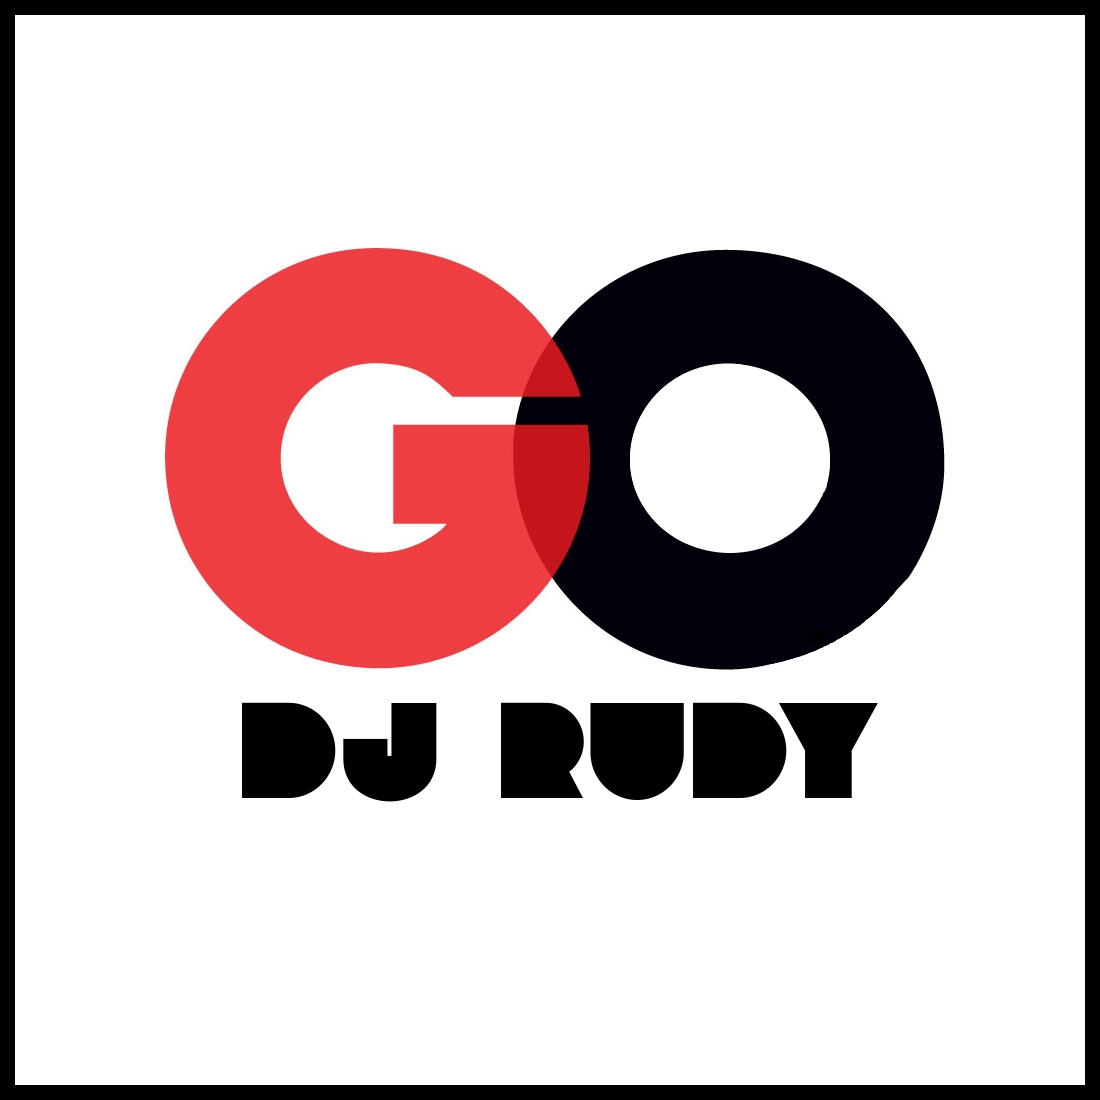 GO – By Dj Rudy